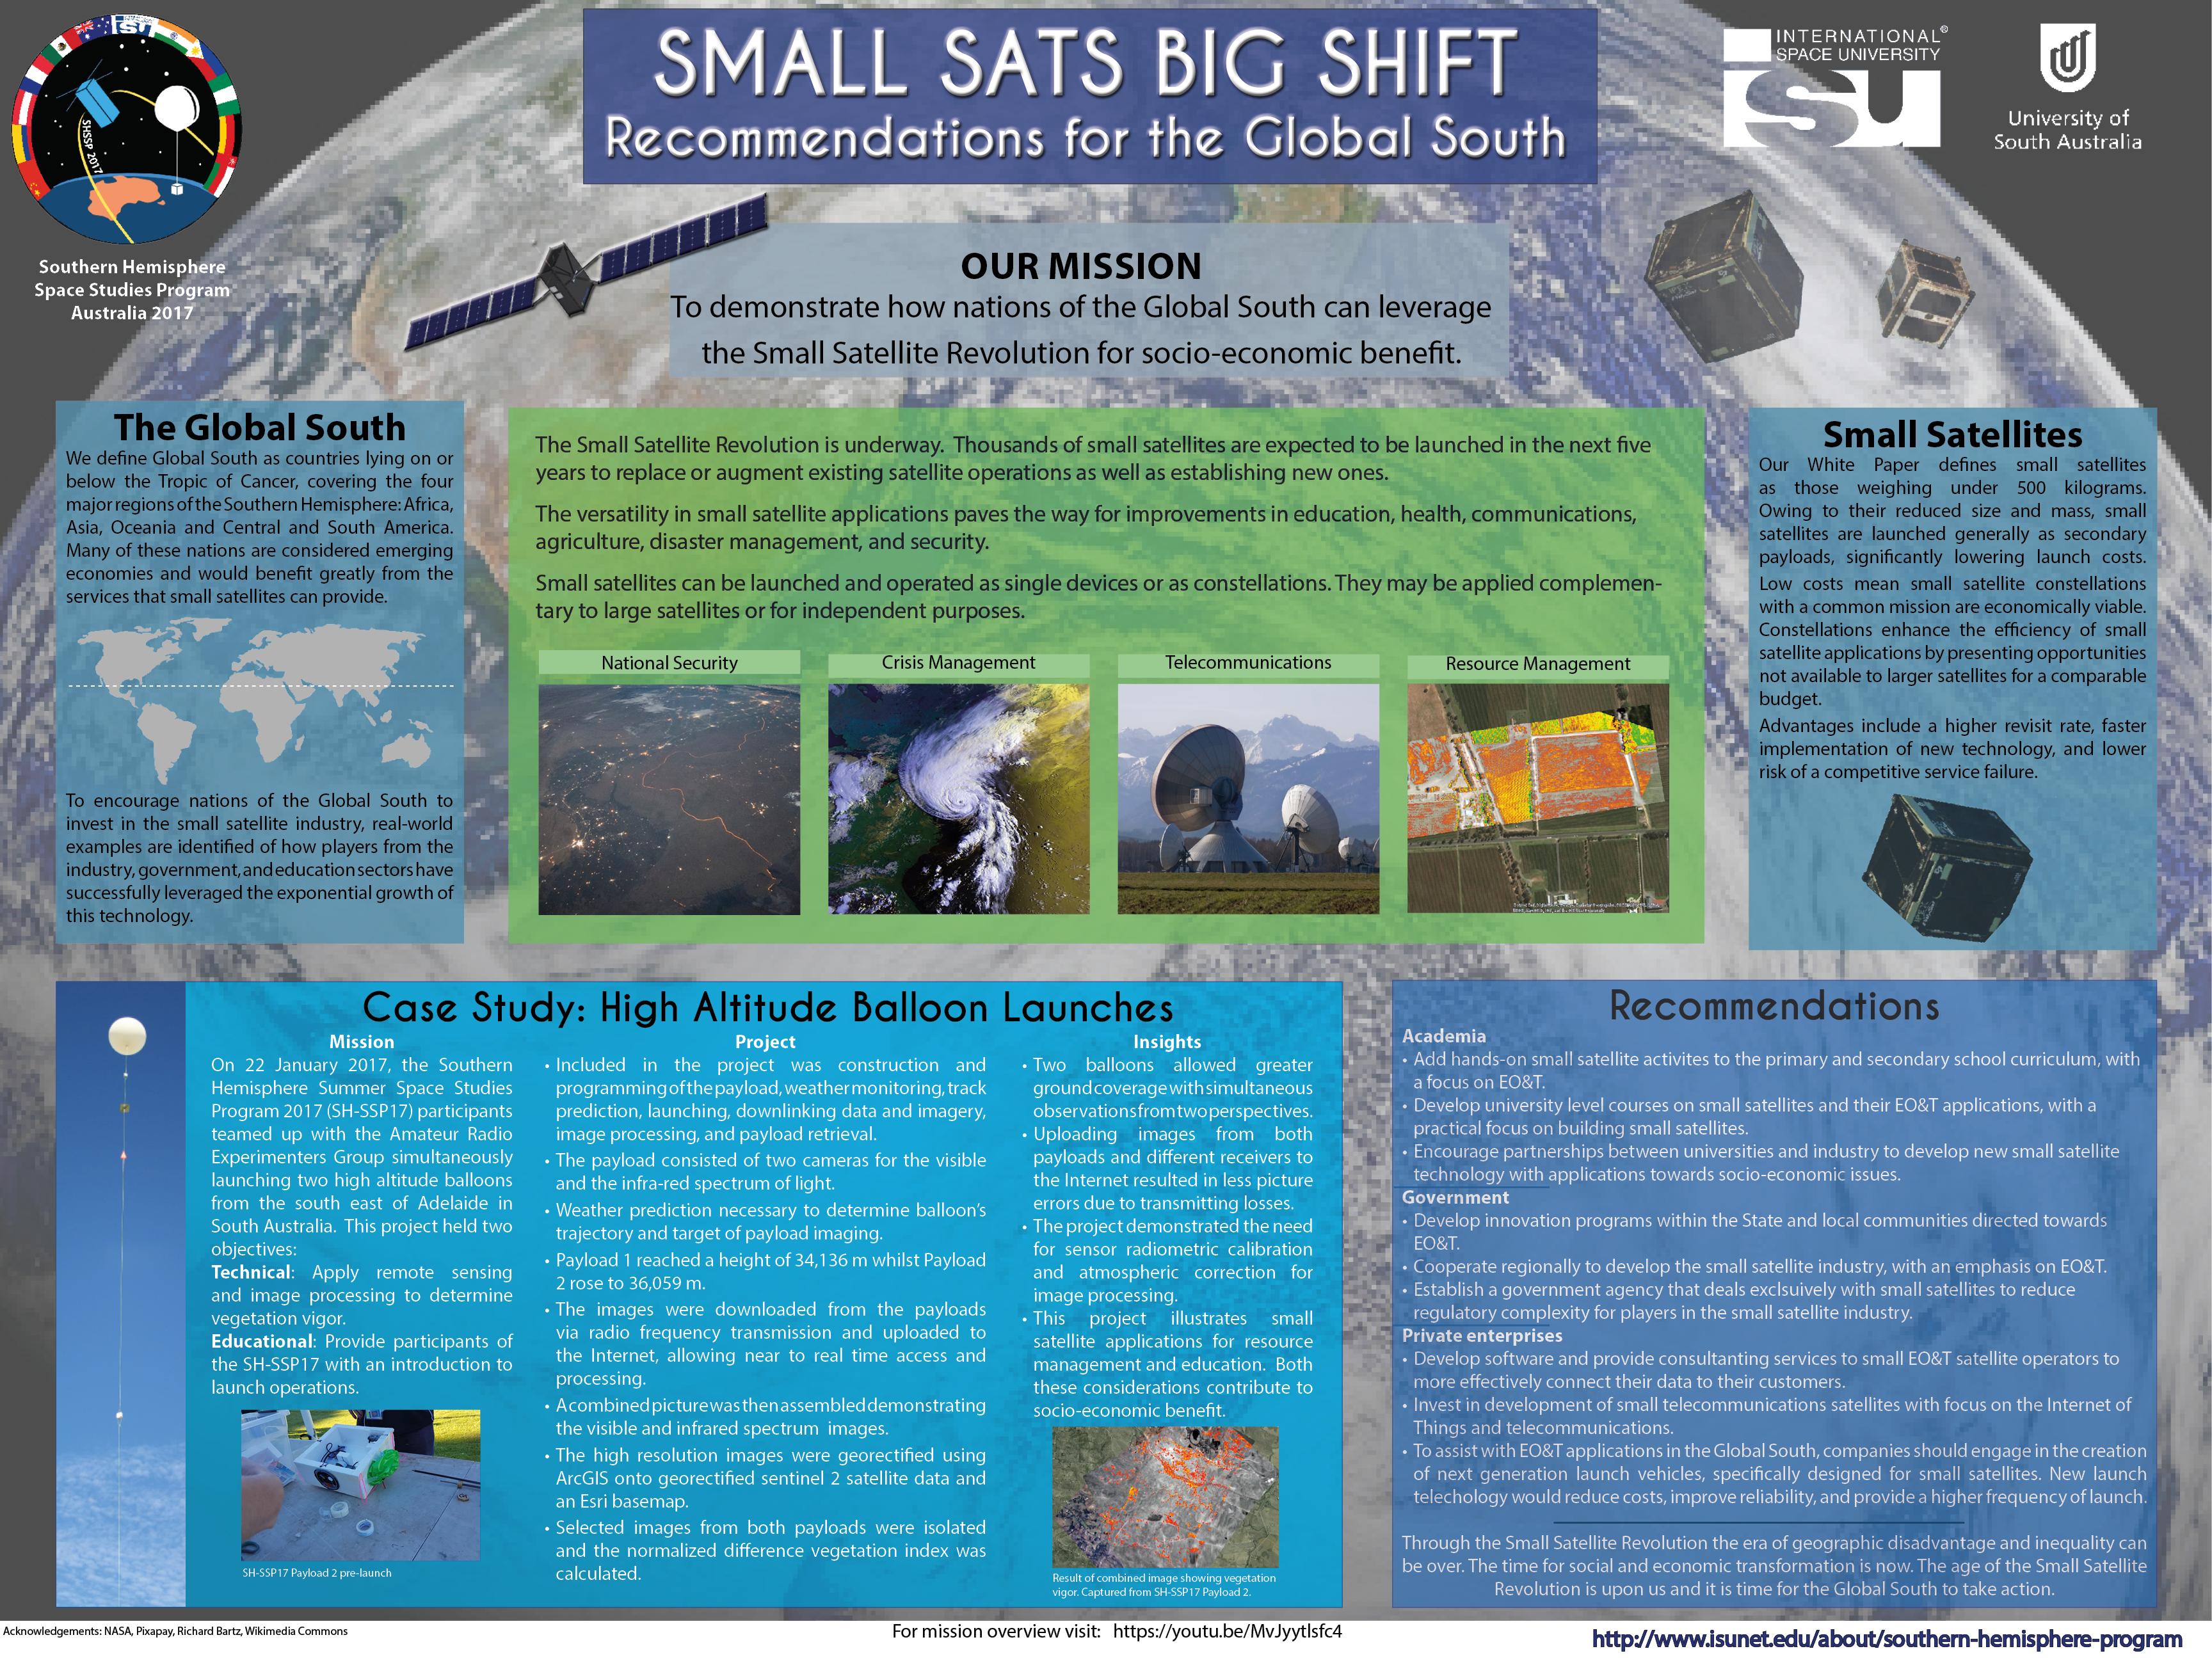 SWF Participates at ISU Southern Hemisphere Space Studies